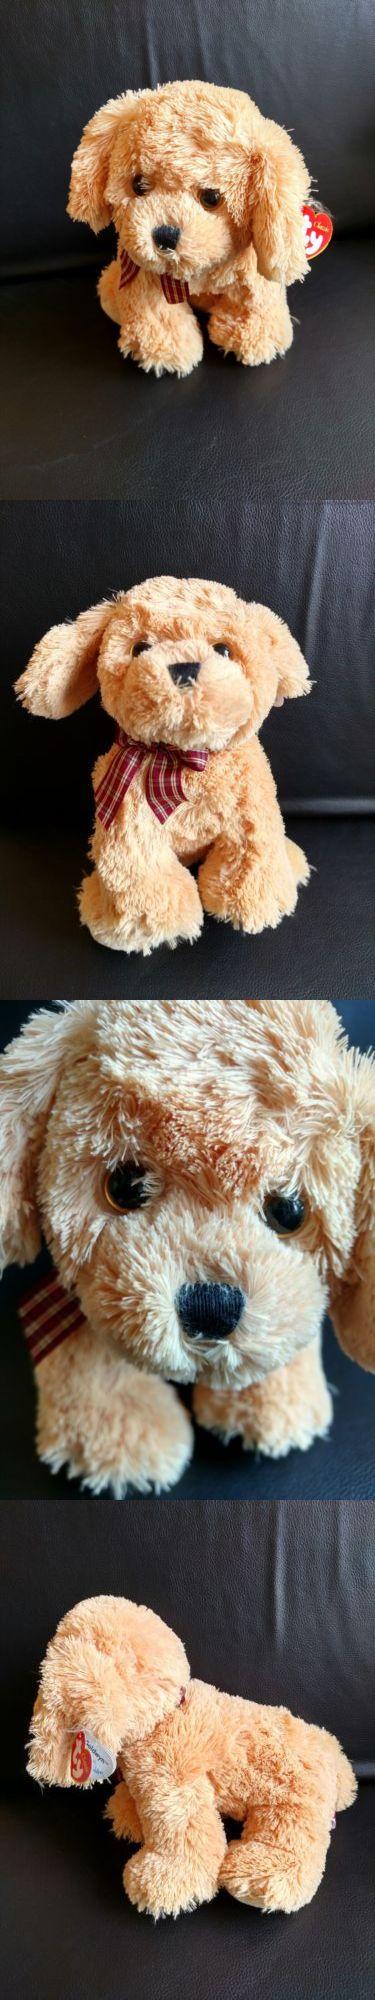 370e10b24ea Beanbag Plush 49019  Ty Classic Plush - Goldwyn The Dog (9 Inch) - Mwmts  Stuffed Animal Toy -  BUY IT NOW ONLY   10 on eBay!